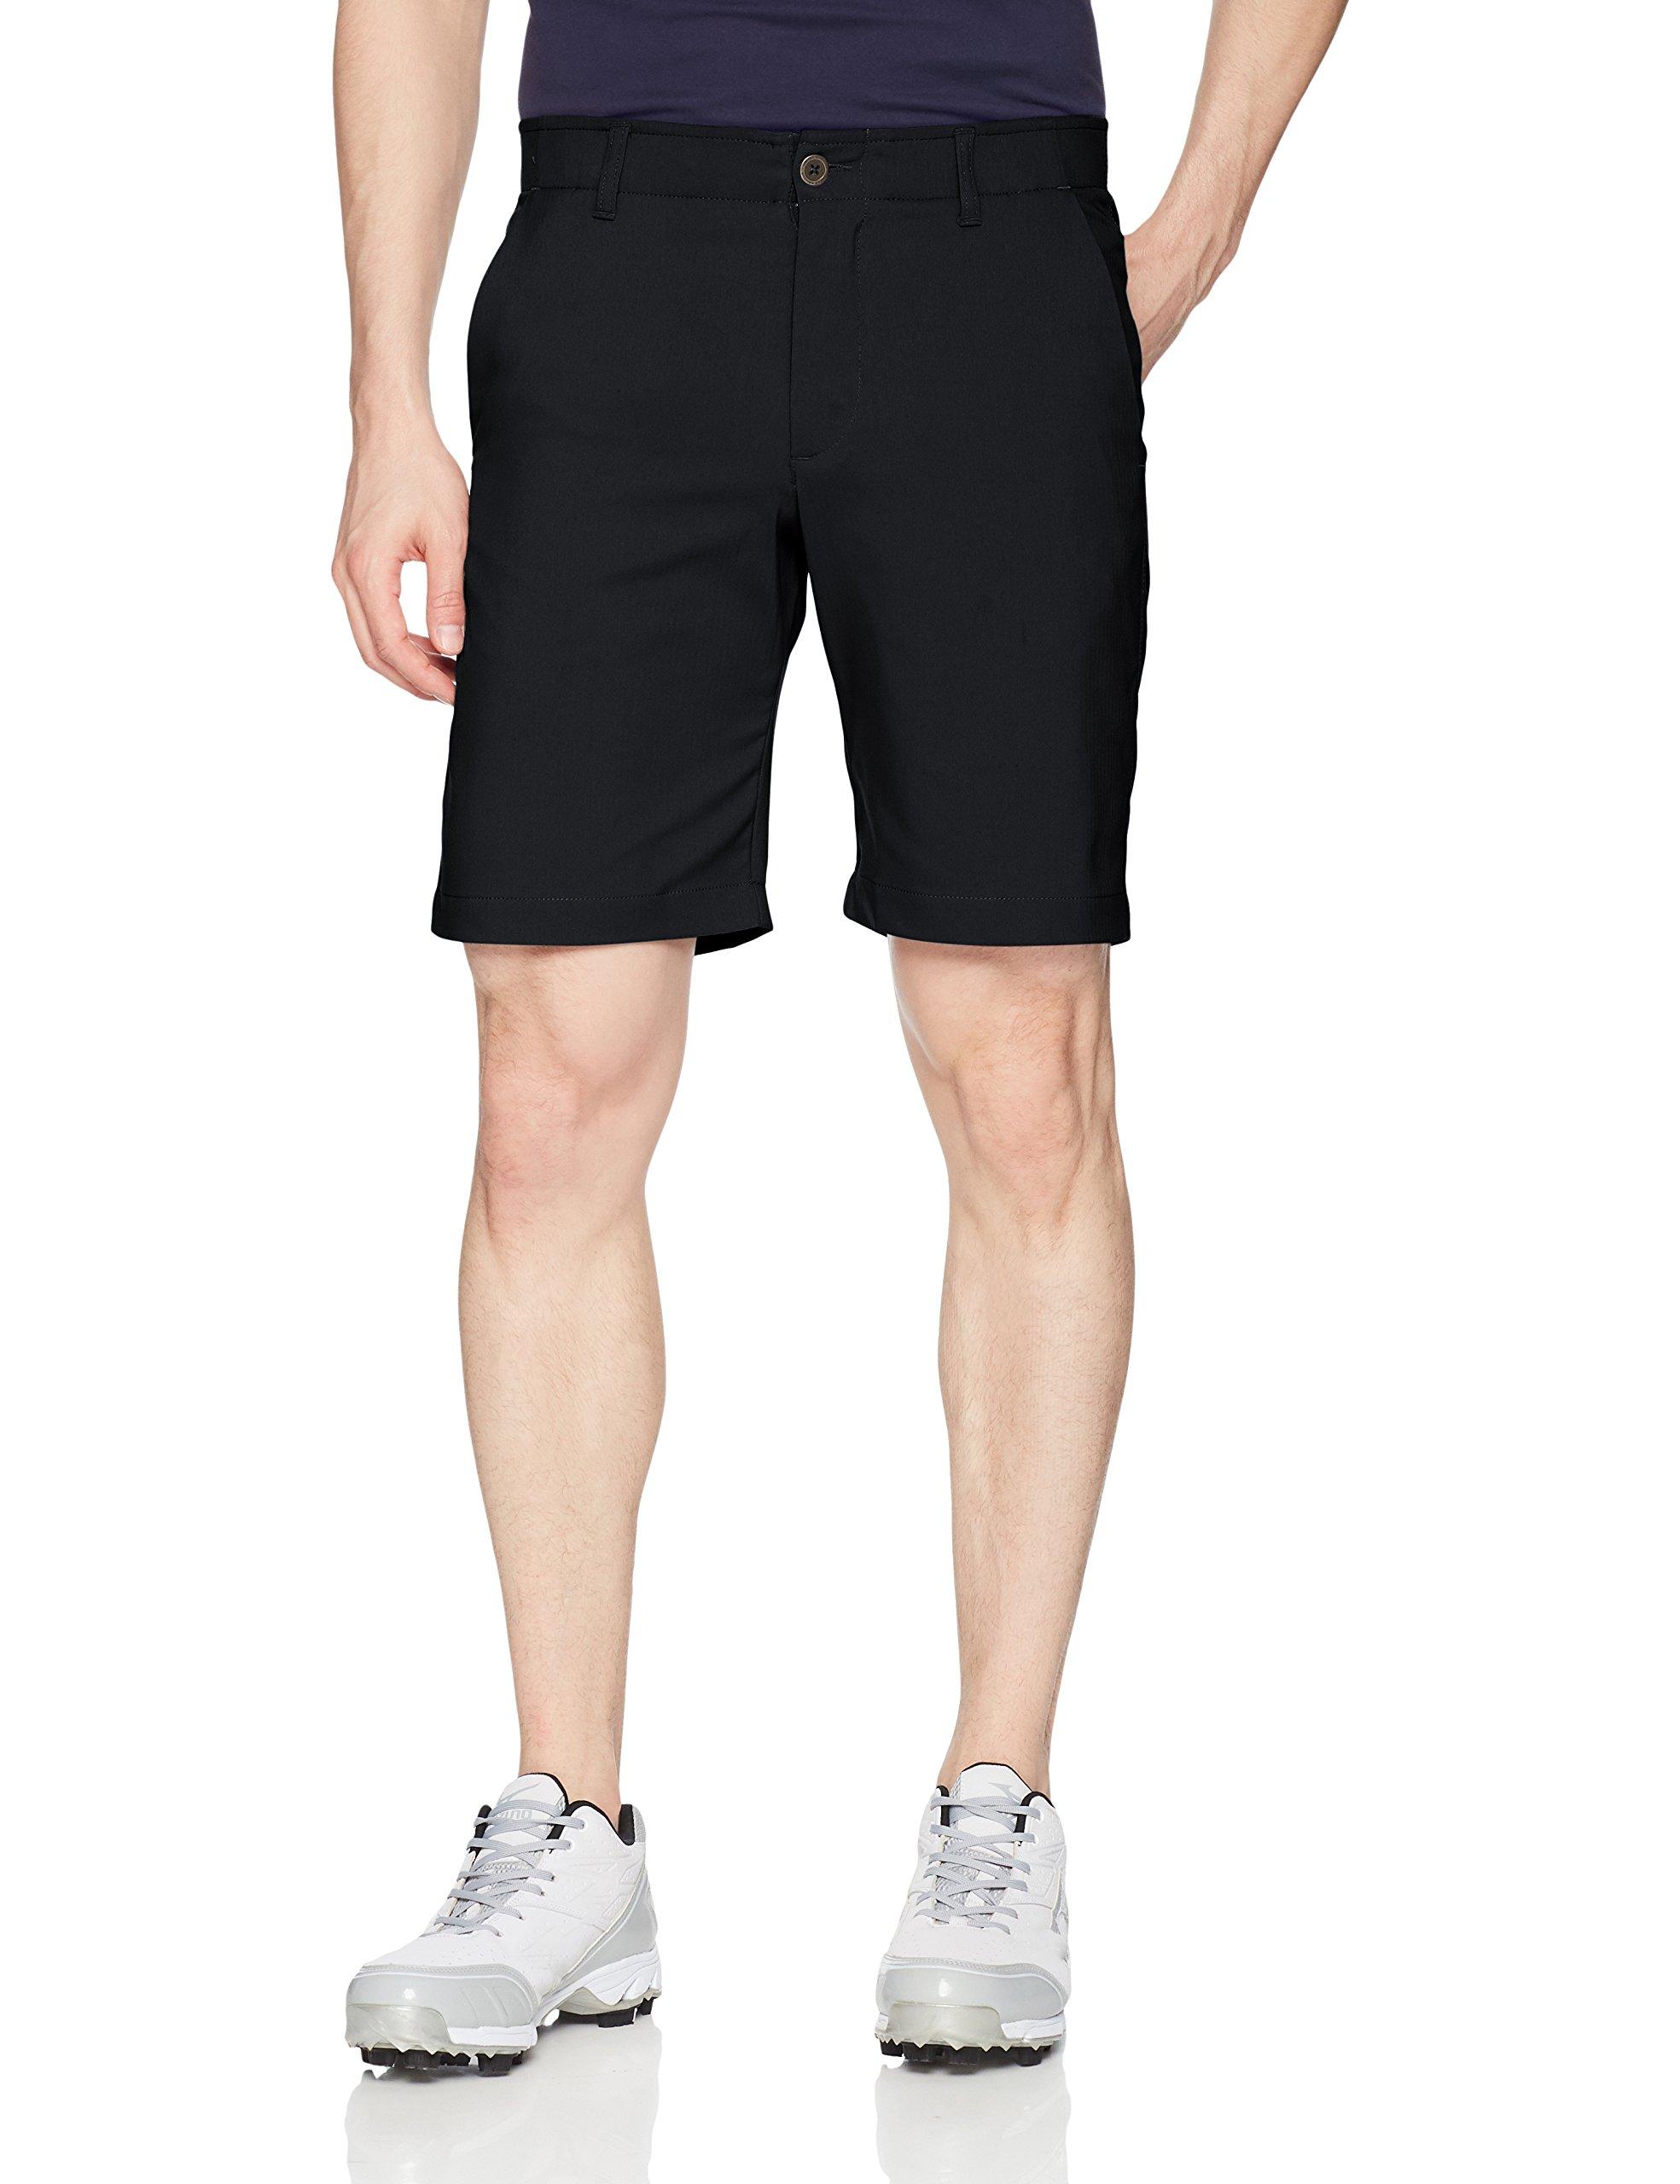 Under Armour Mens Takeover Golf Short, Black (001)/Black, 34